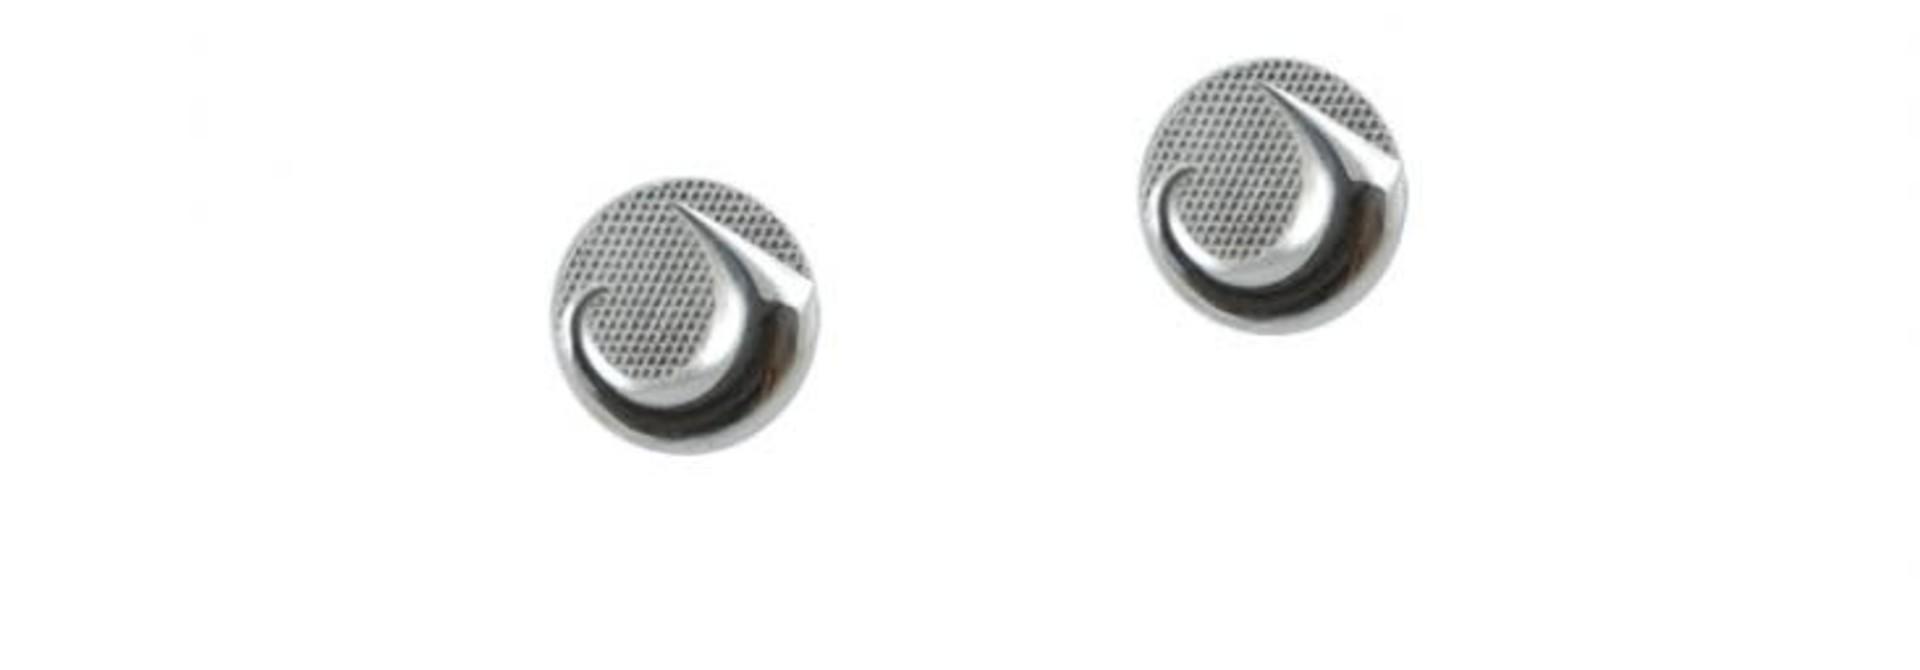 Silver Pewter Earrings - Land by Corrine Hunt